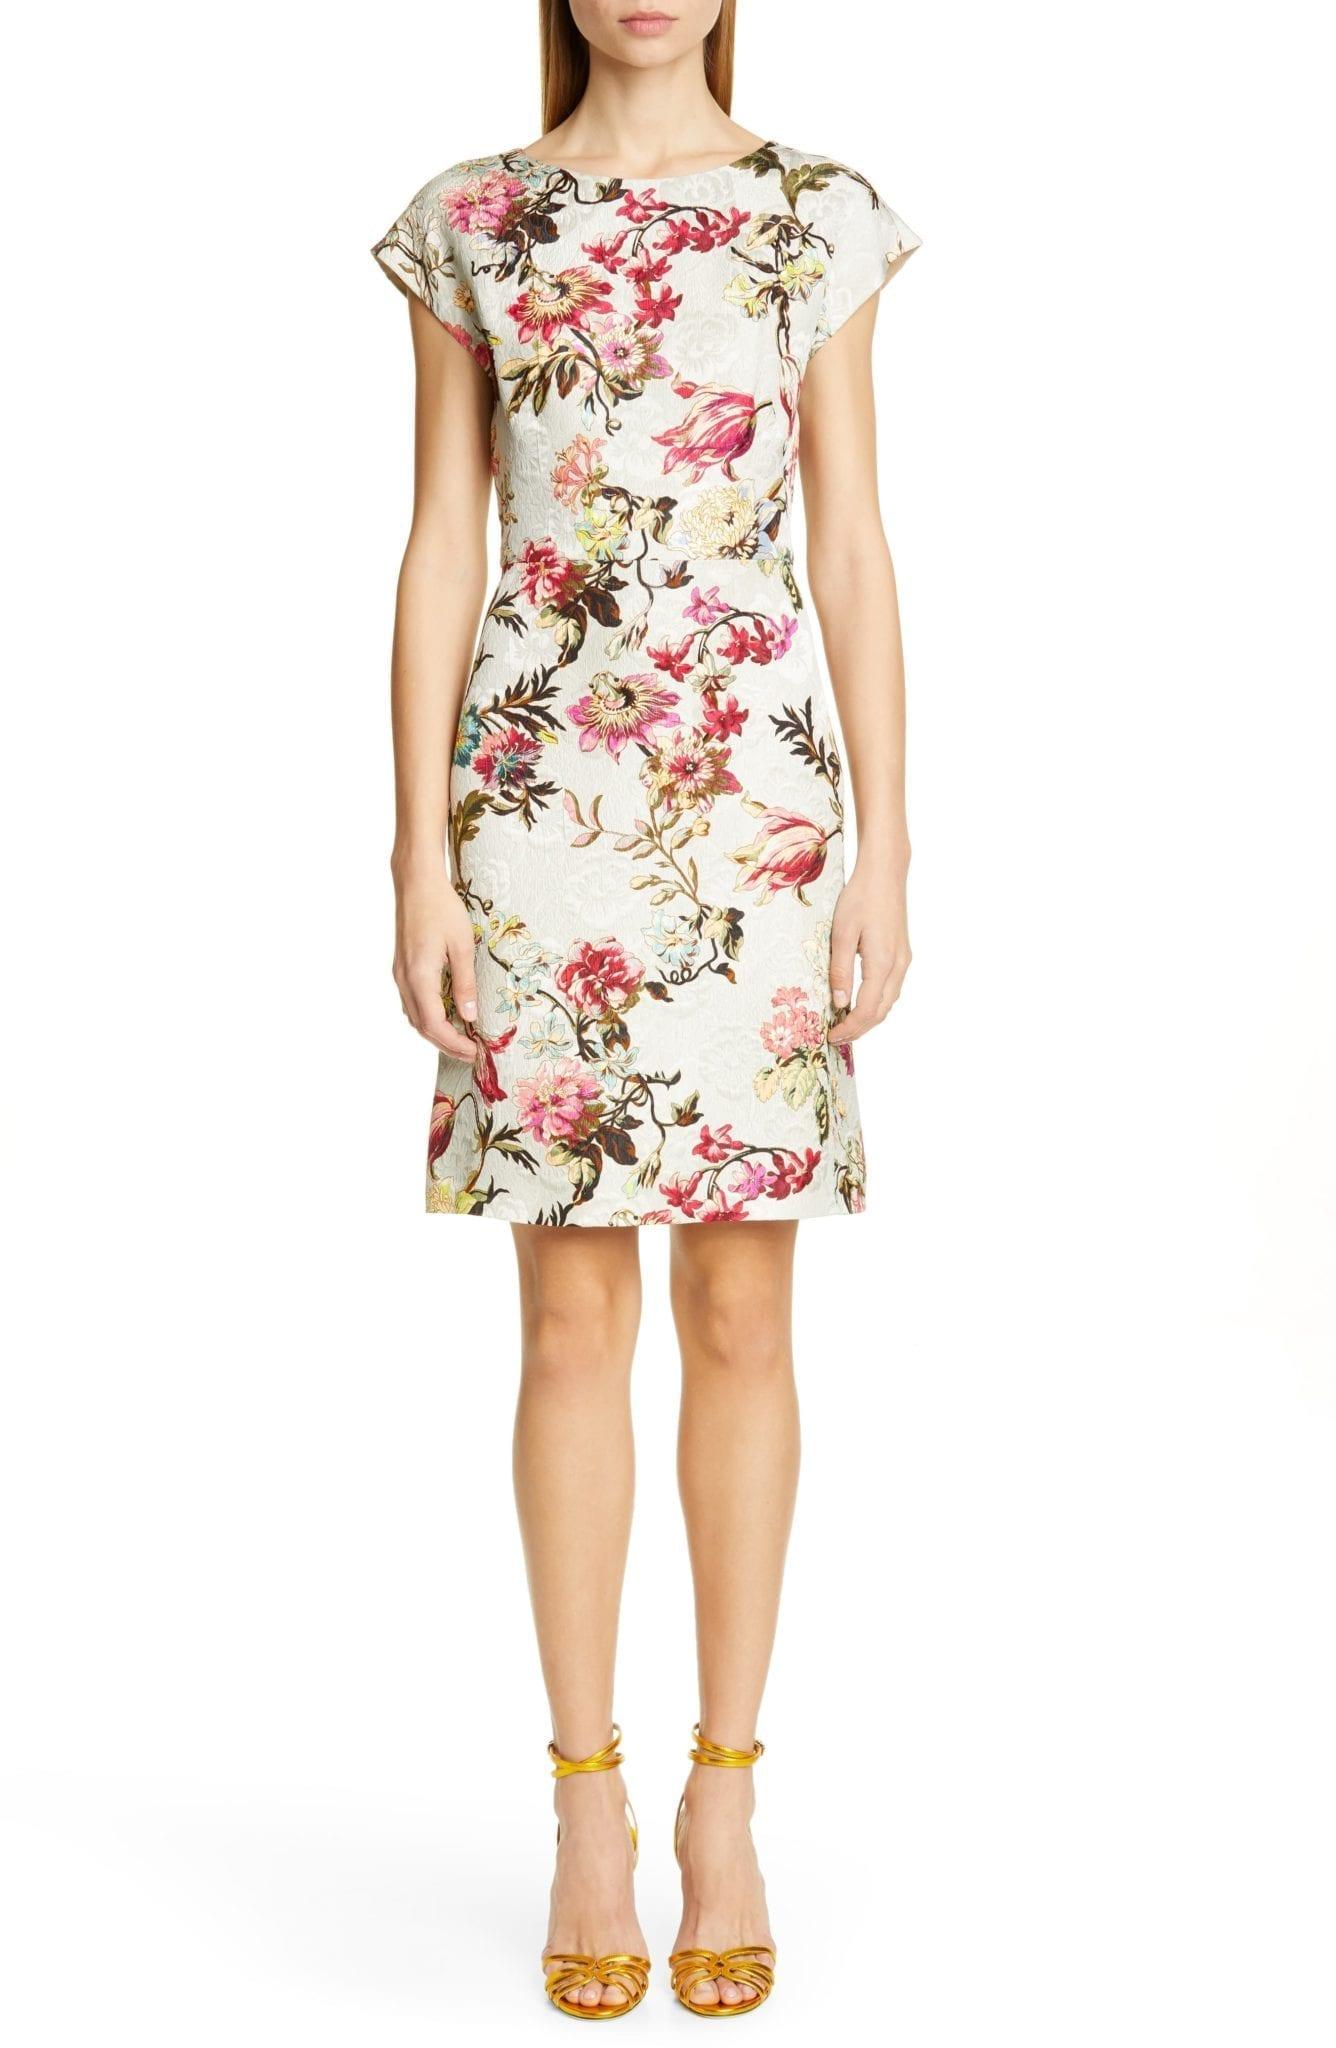 ETRO Floral Jacquard Sheath Dress